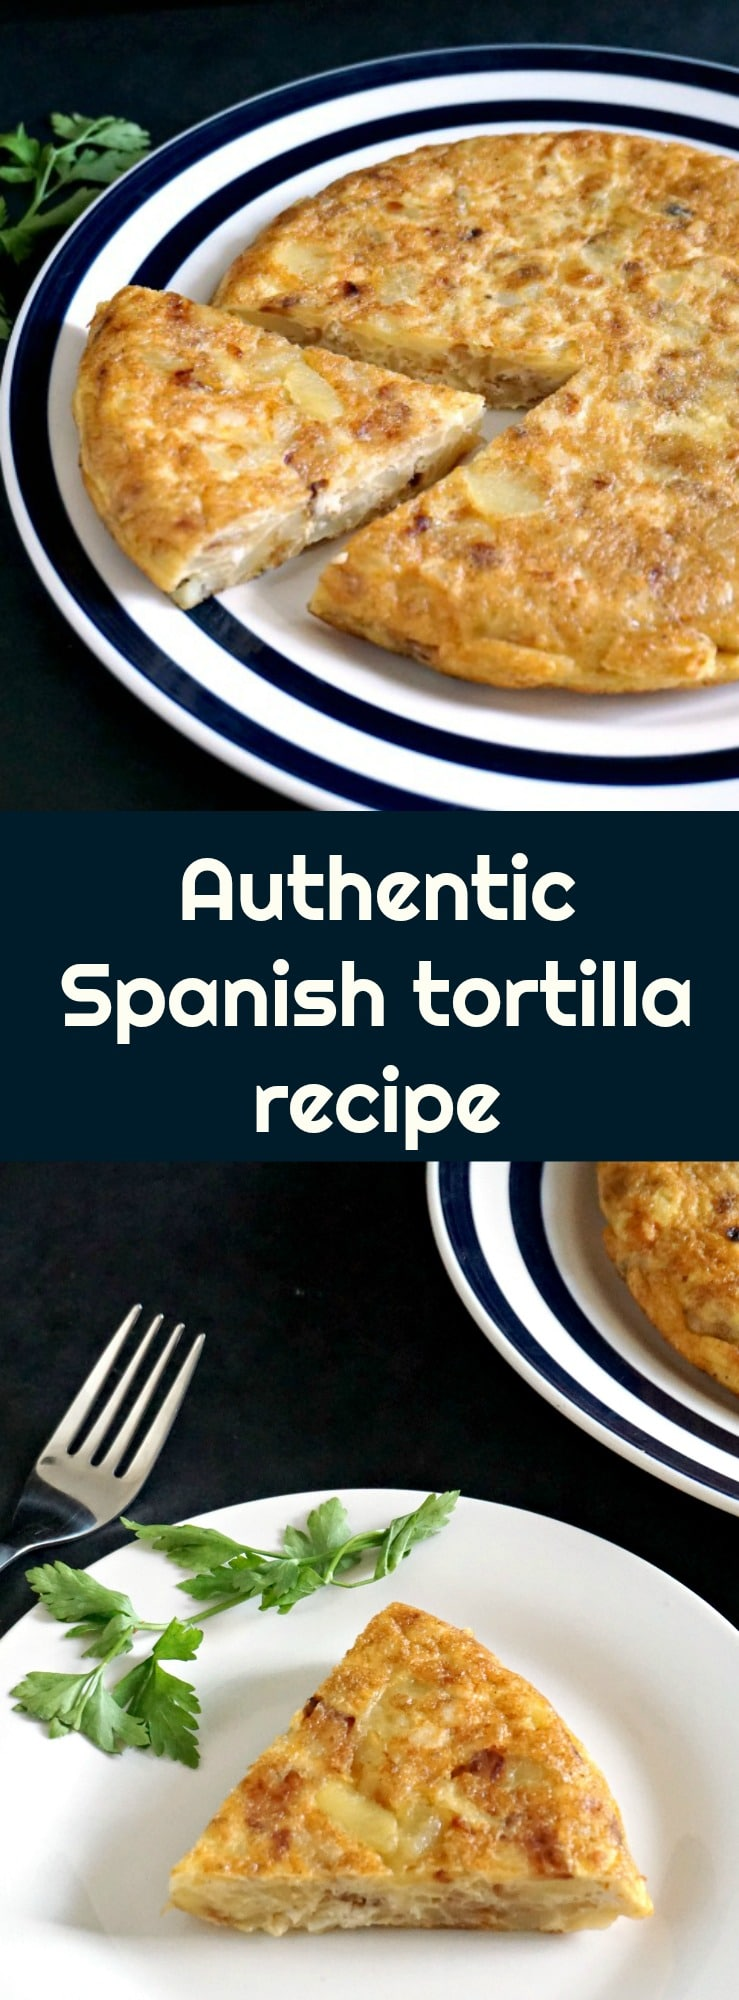 Authentic Spanish tortilla recipe | Tortilla española